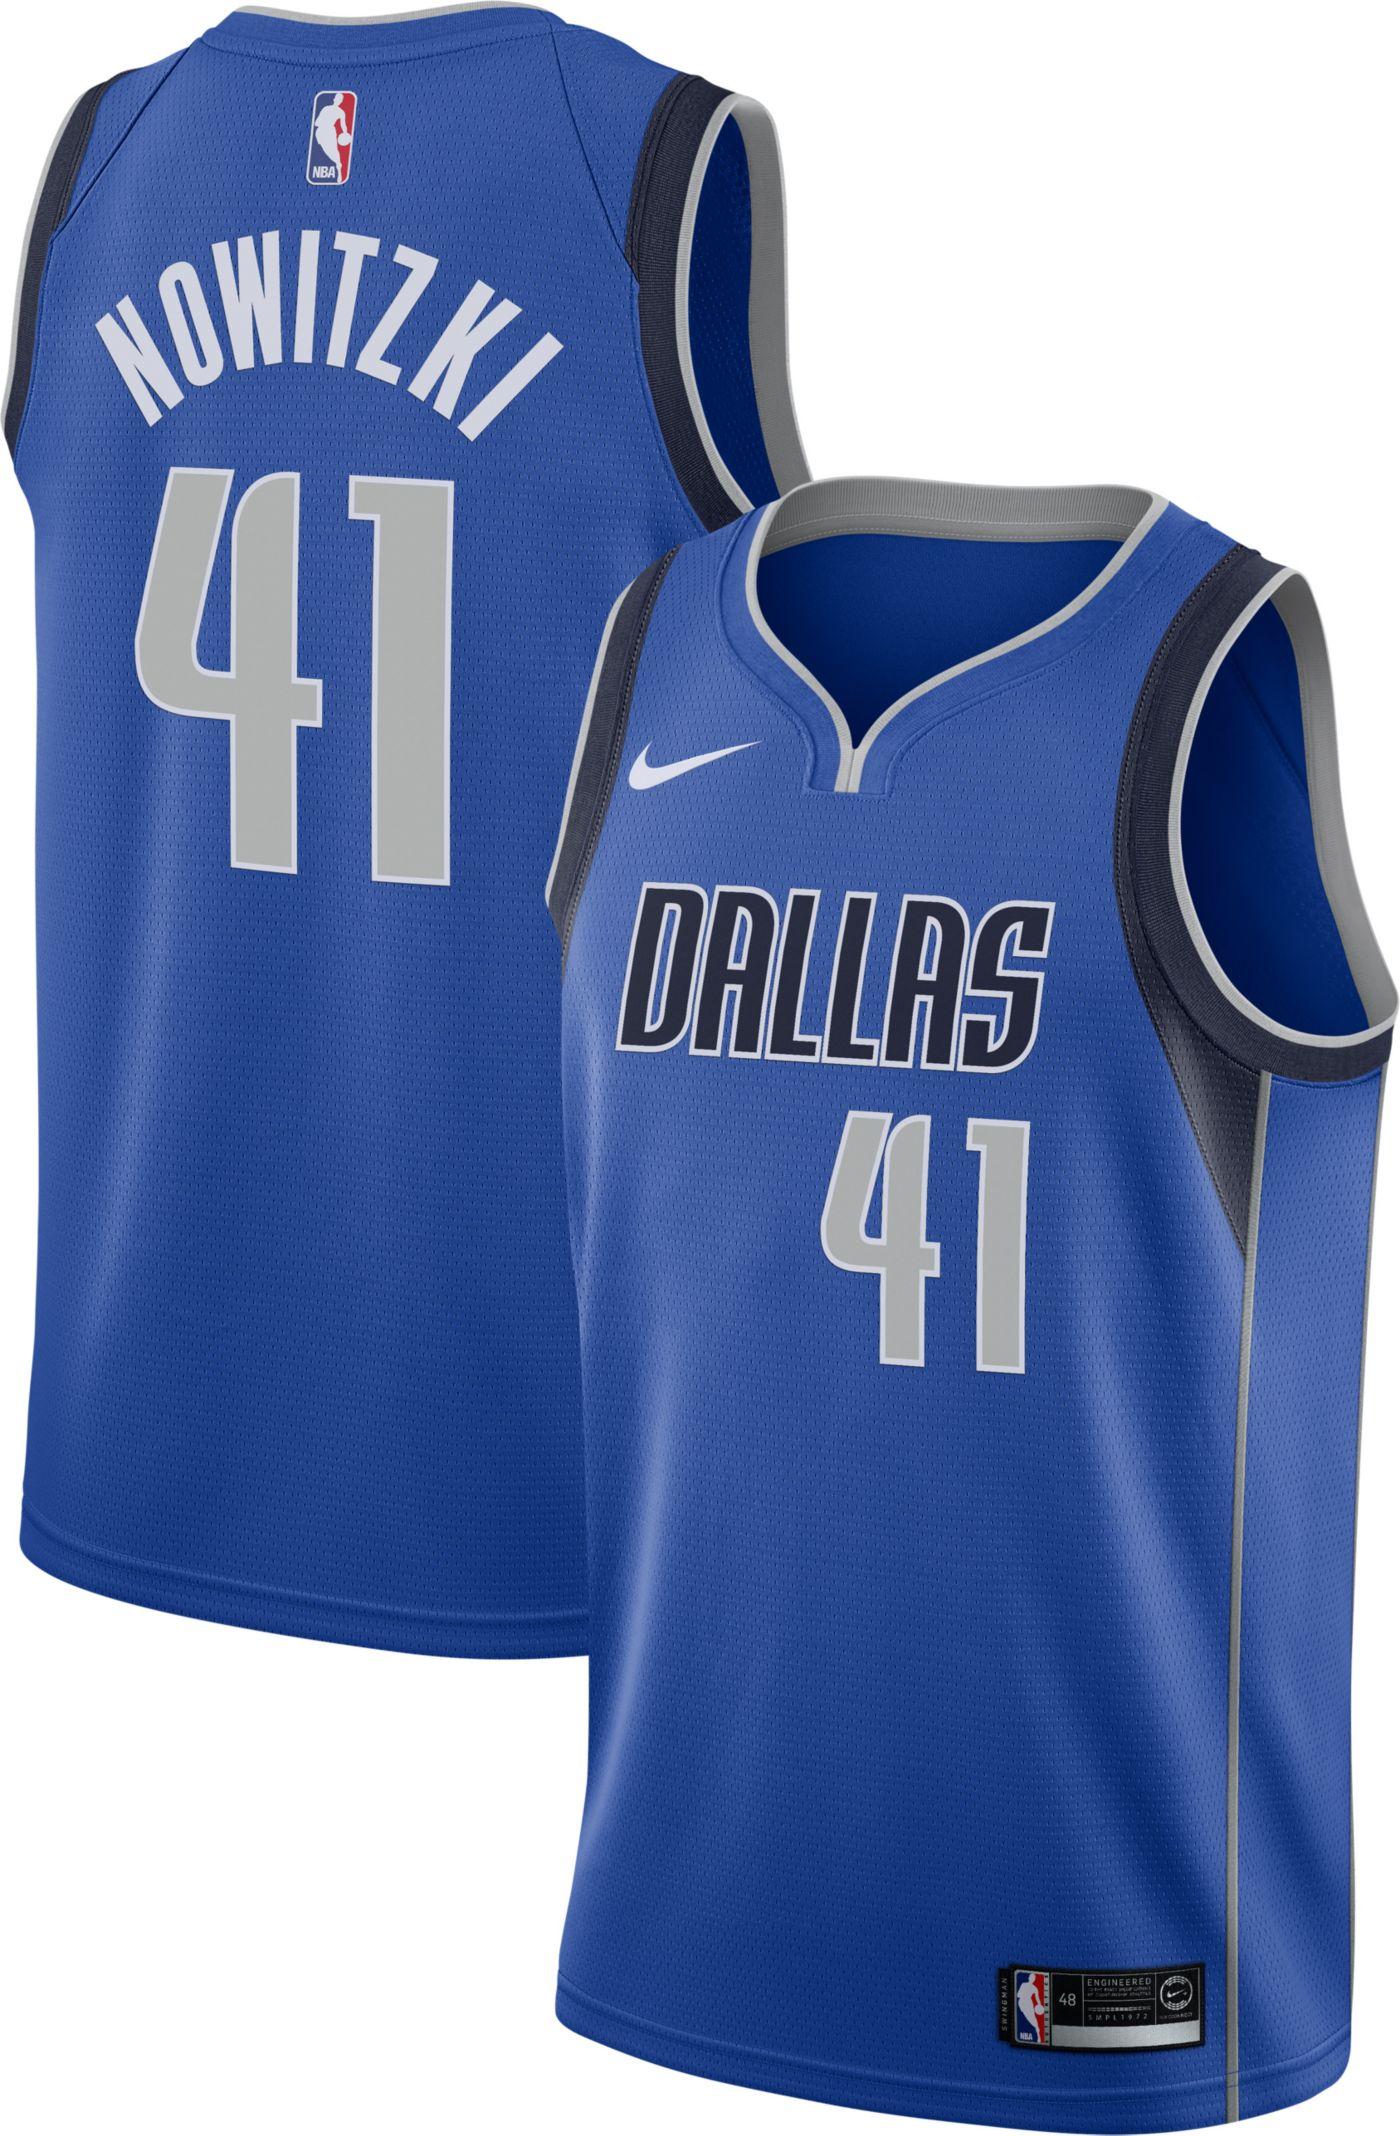 Nike Men's Dallas Mavericks Dirk Nowitzki #41 Royal Dri-FIT Swingman Jersey